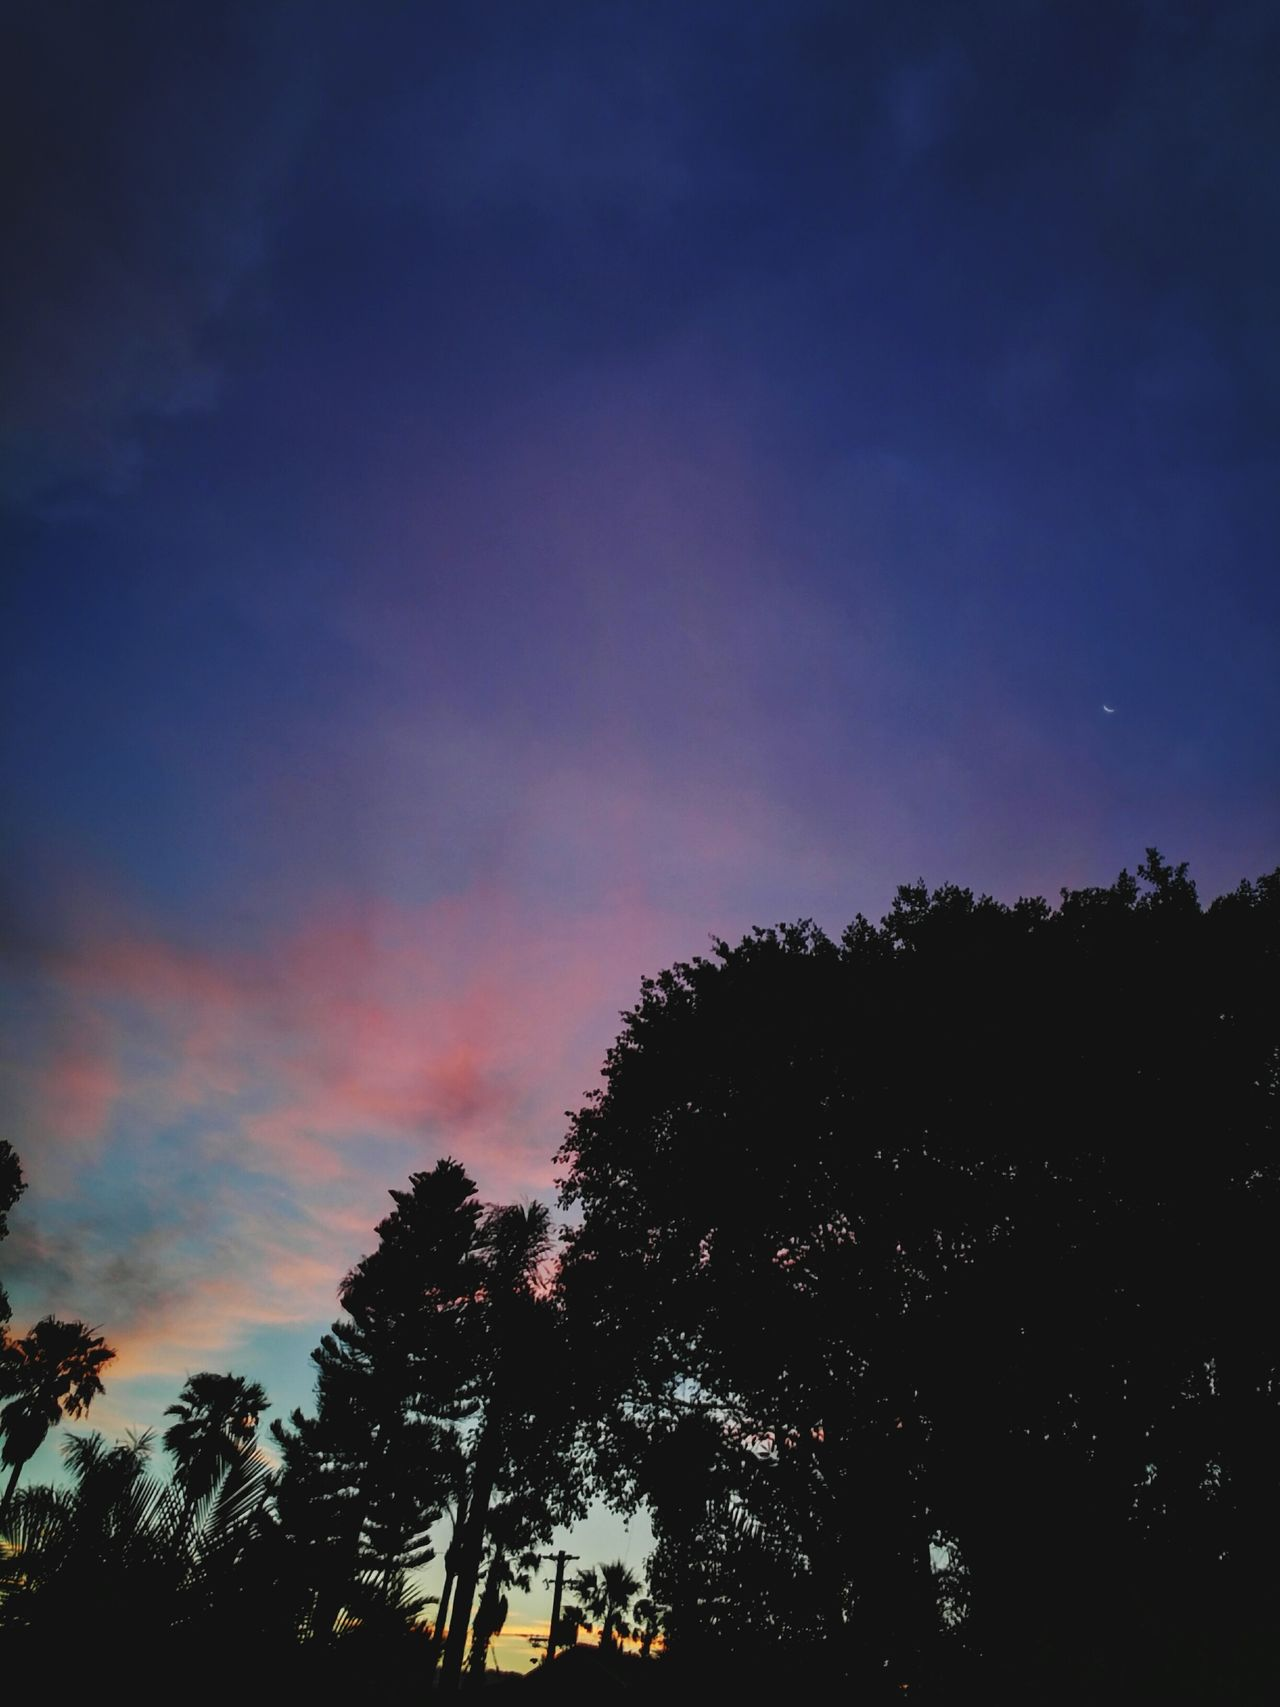 sunset #sun #clouds #skylovers #sky #nature #beautifulinnature #naturalbeauty photography landscape Sunset Silhouettes Silhouette_collection Silhouette Rainbow Sky Palm Tree Palm Trees Palm Tree Silhouette